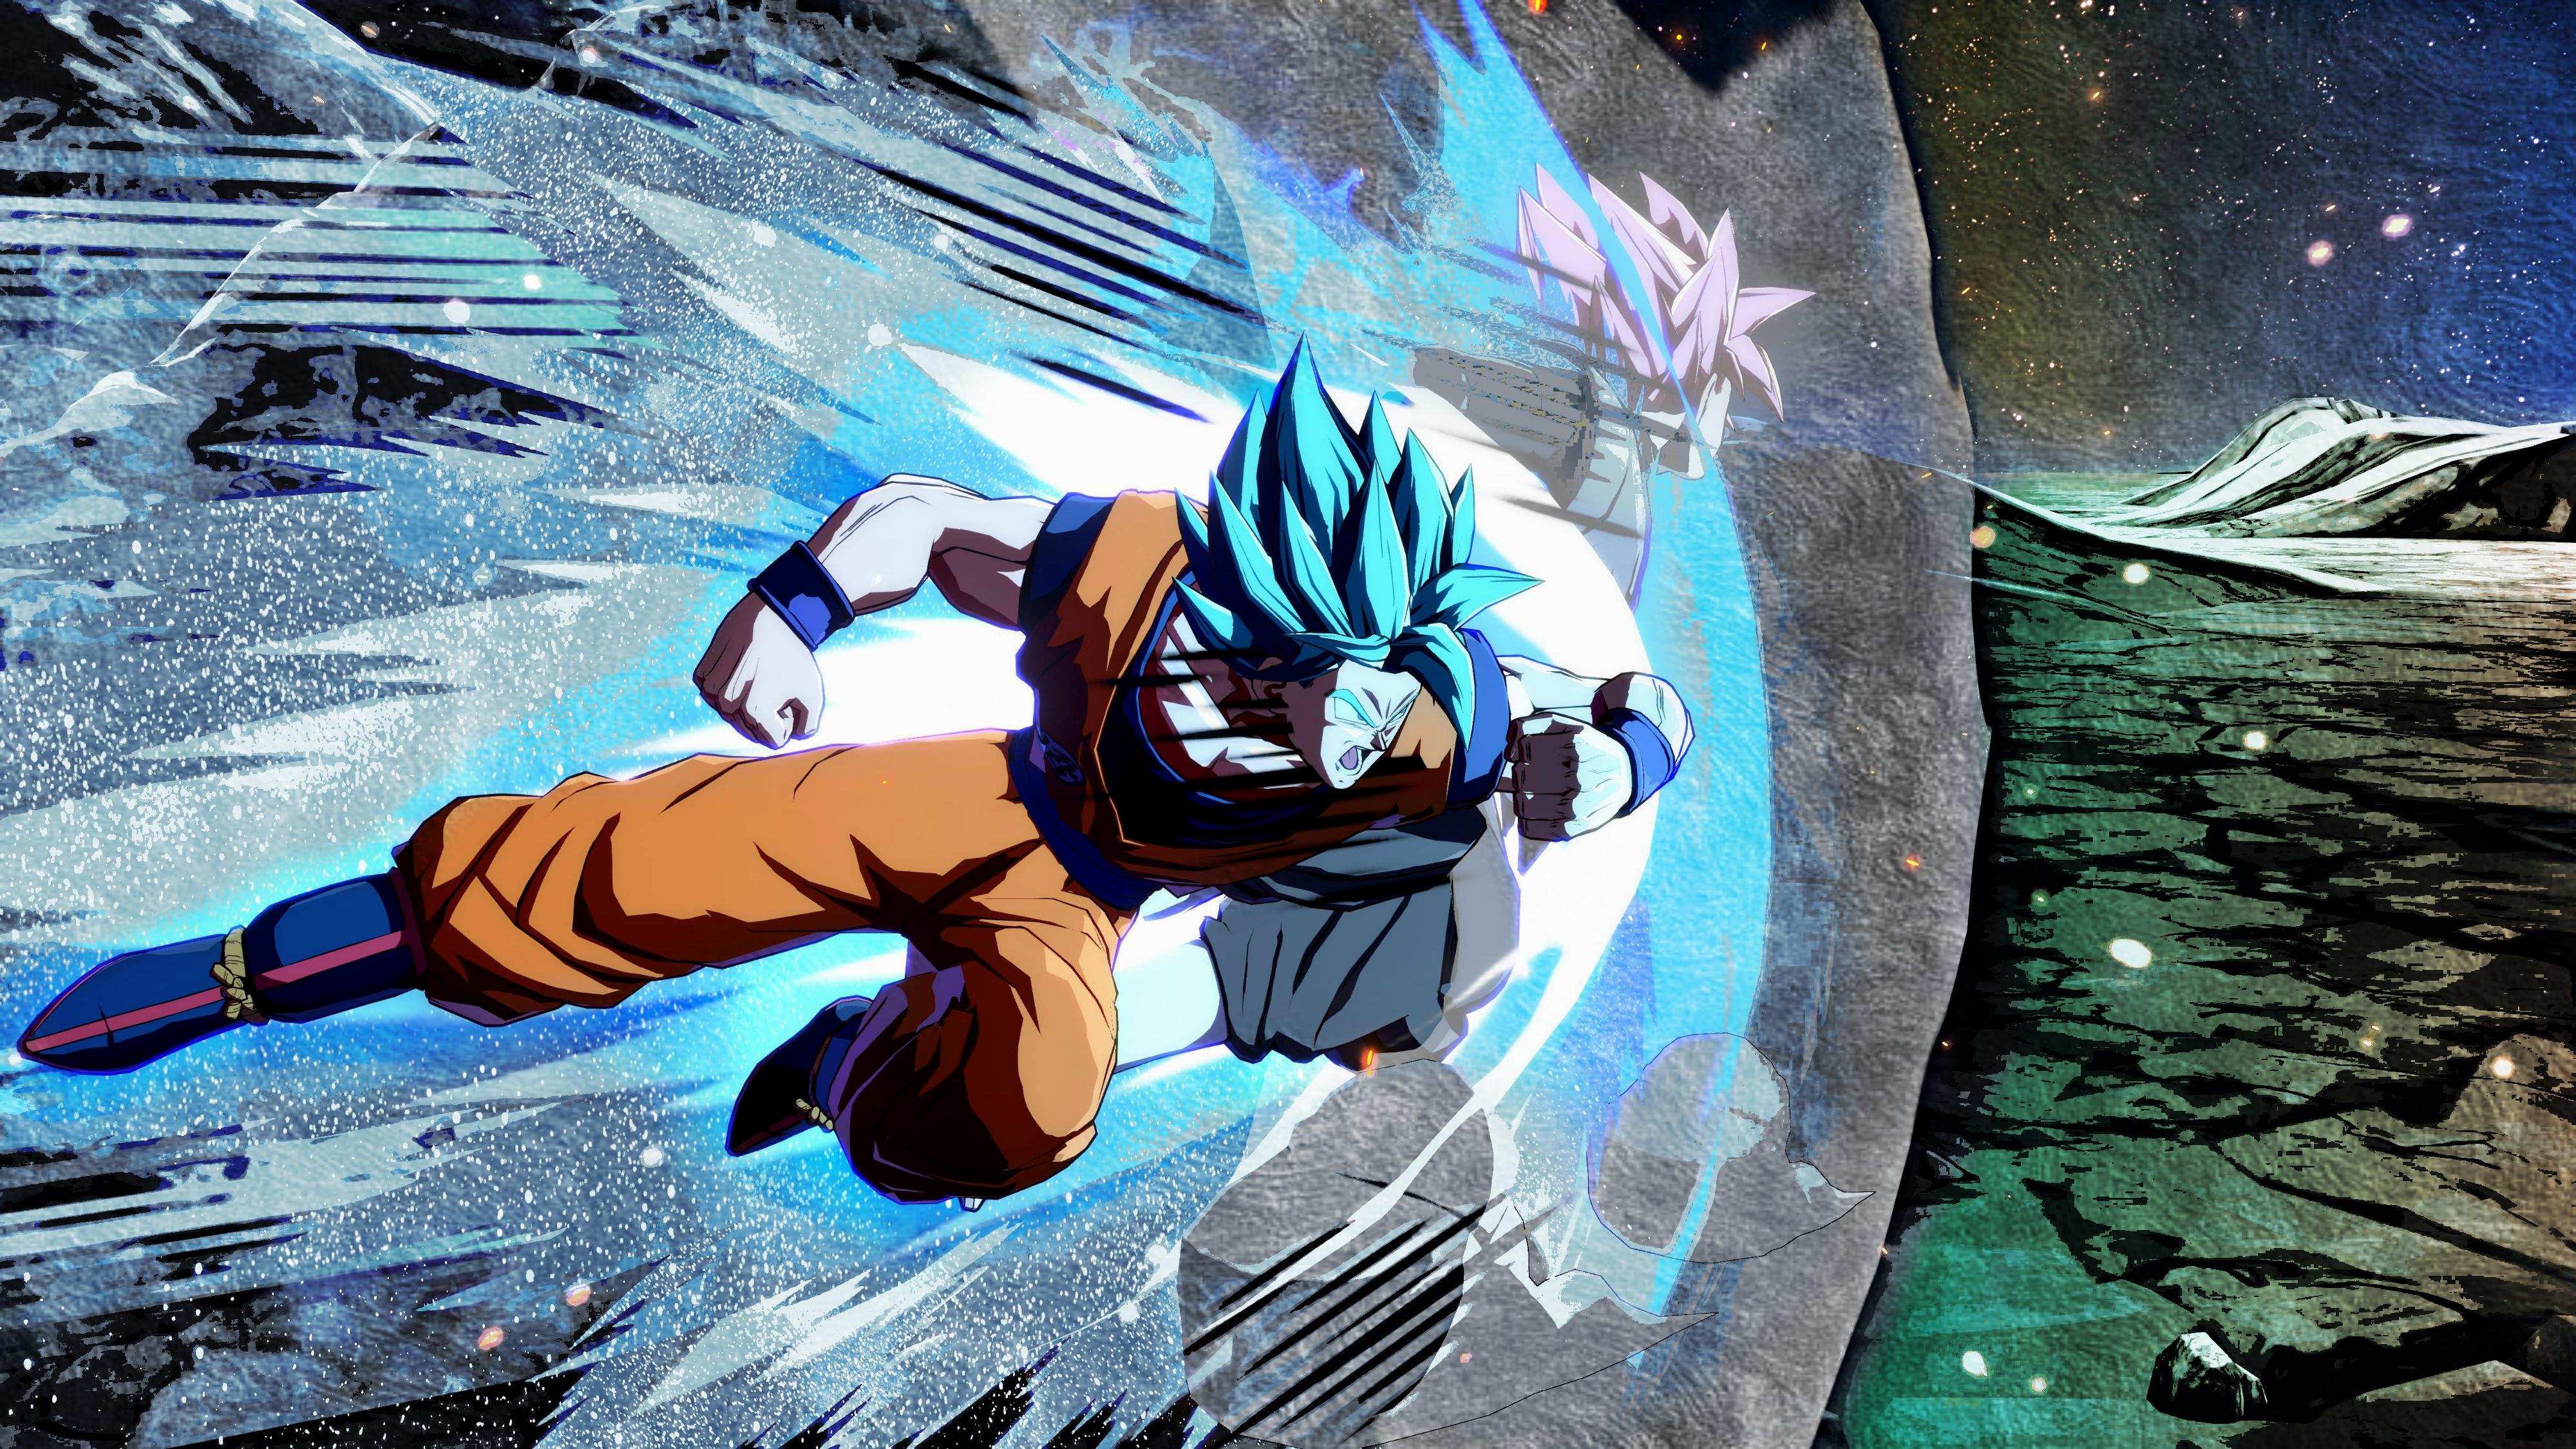 Goku Ssj Blue Vs Goku Black Ssj Rose 4k Wallpaper Dragonballfighterz